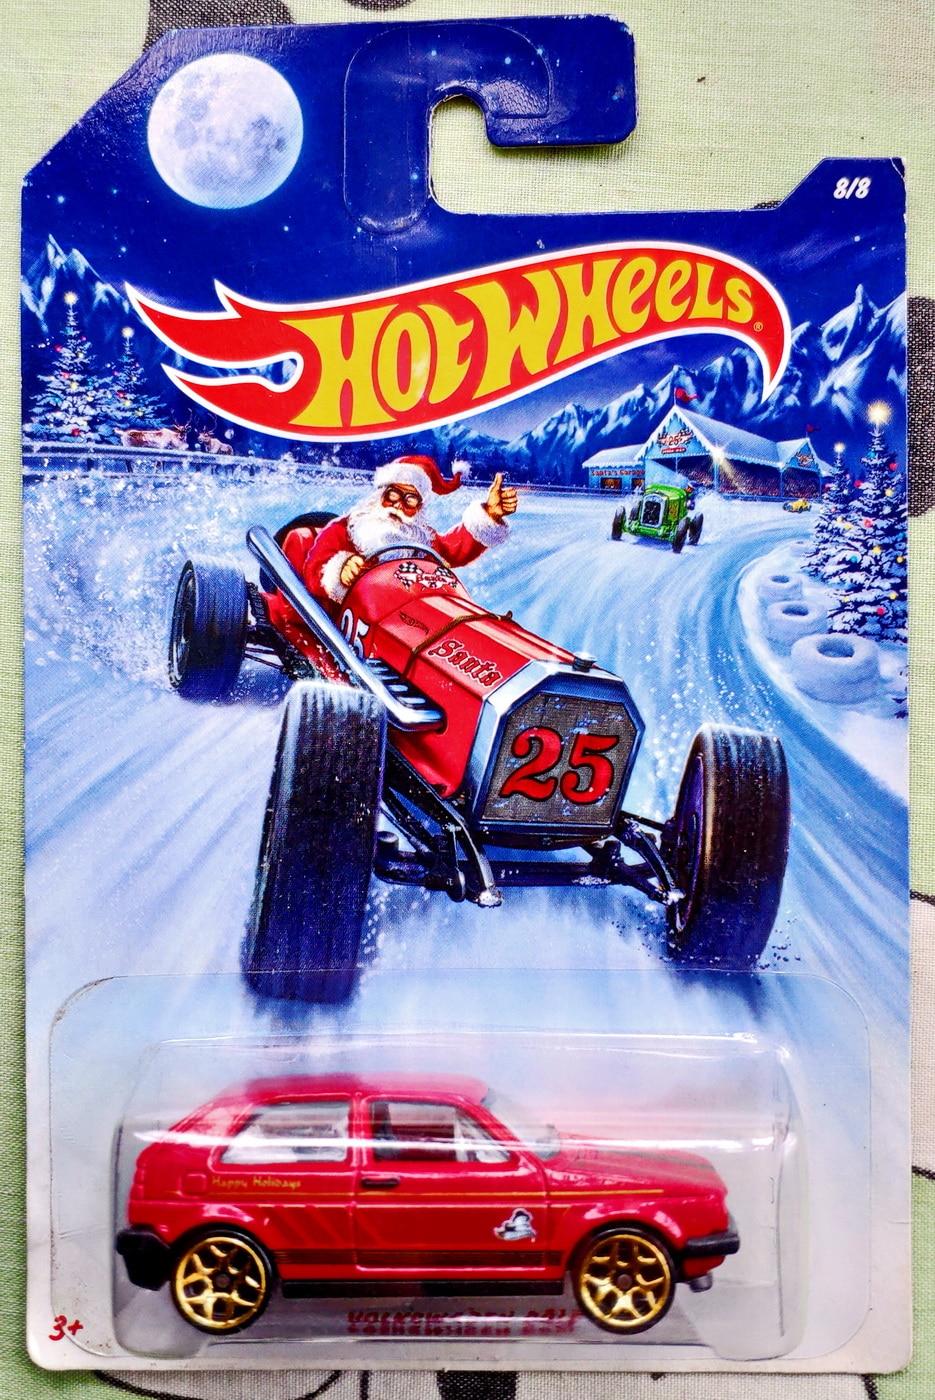 Hot Wheels 1:64 Car Collector Edition VOLKSWAGEN GOLF MK2 Car Metal Diecast Model Car Kids Toys Gift